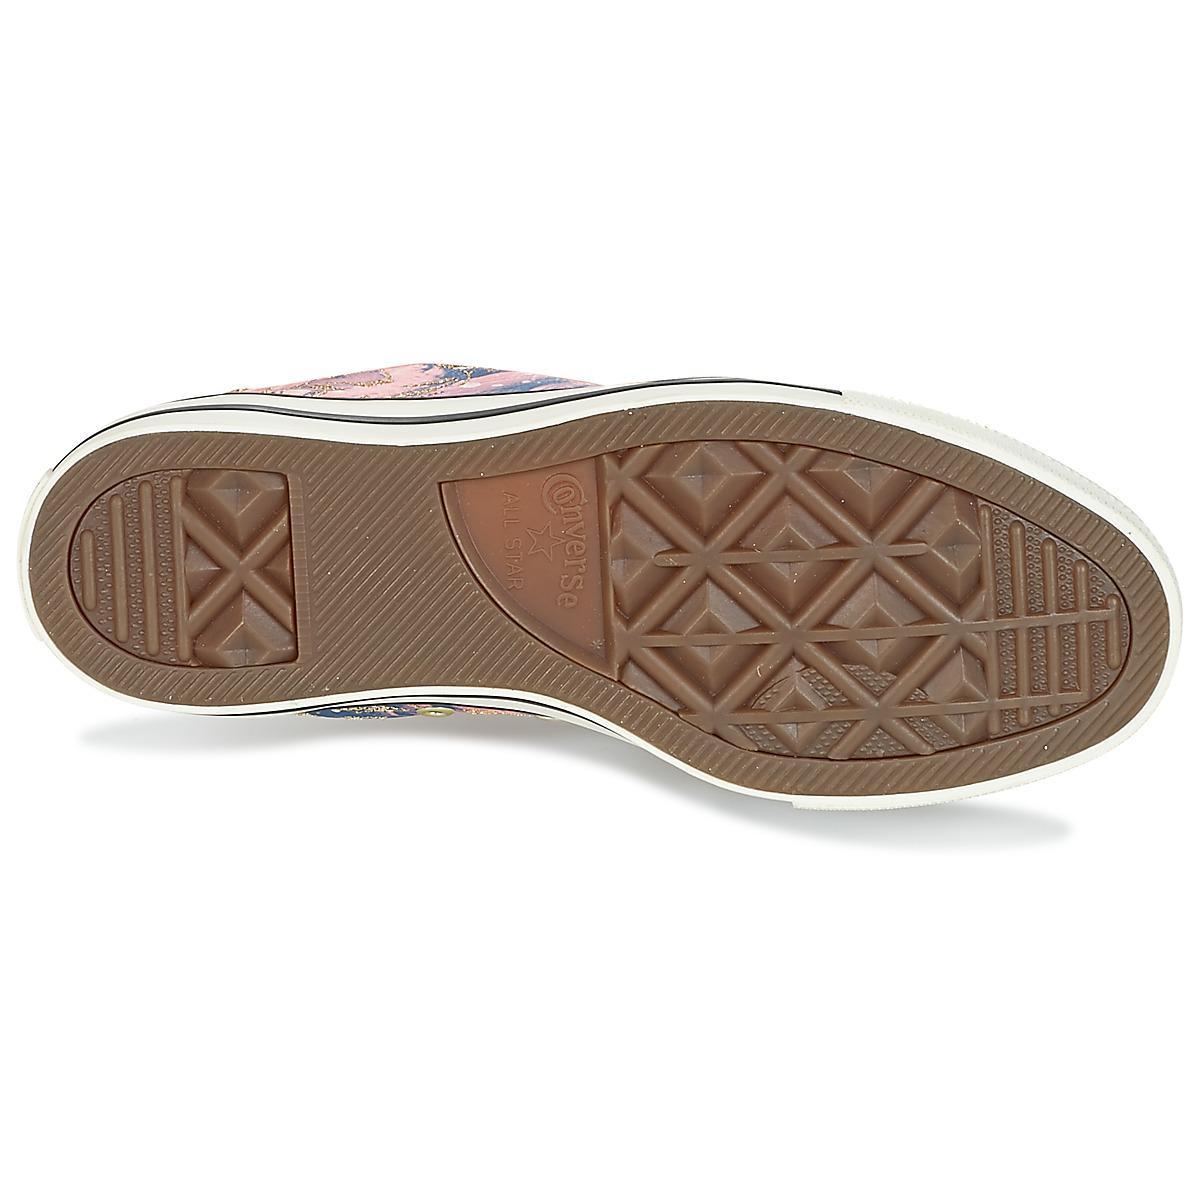 8353fd57052237 Converse Chuck Taylor All Star Hi Feather Print Women s Shoes (high ...